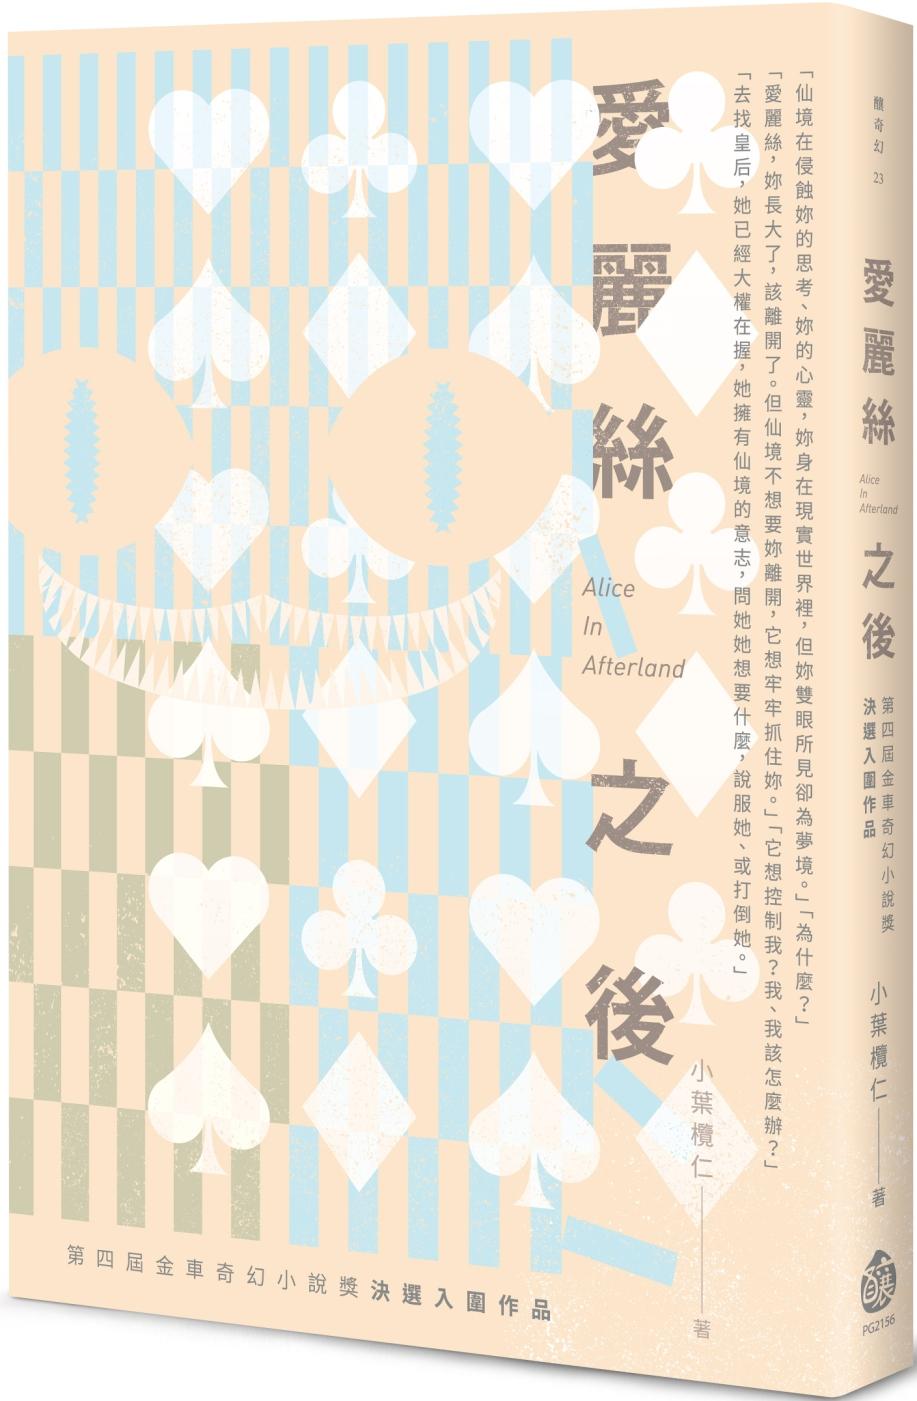 愛麗絲之後Alice In Afterland:第四屆金車奇幻小說獎決選入圍作品